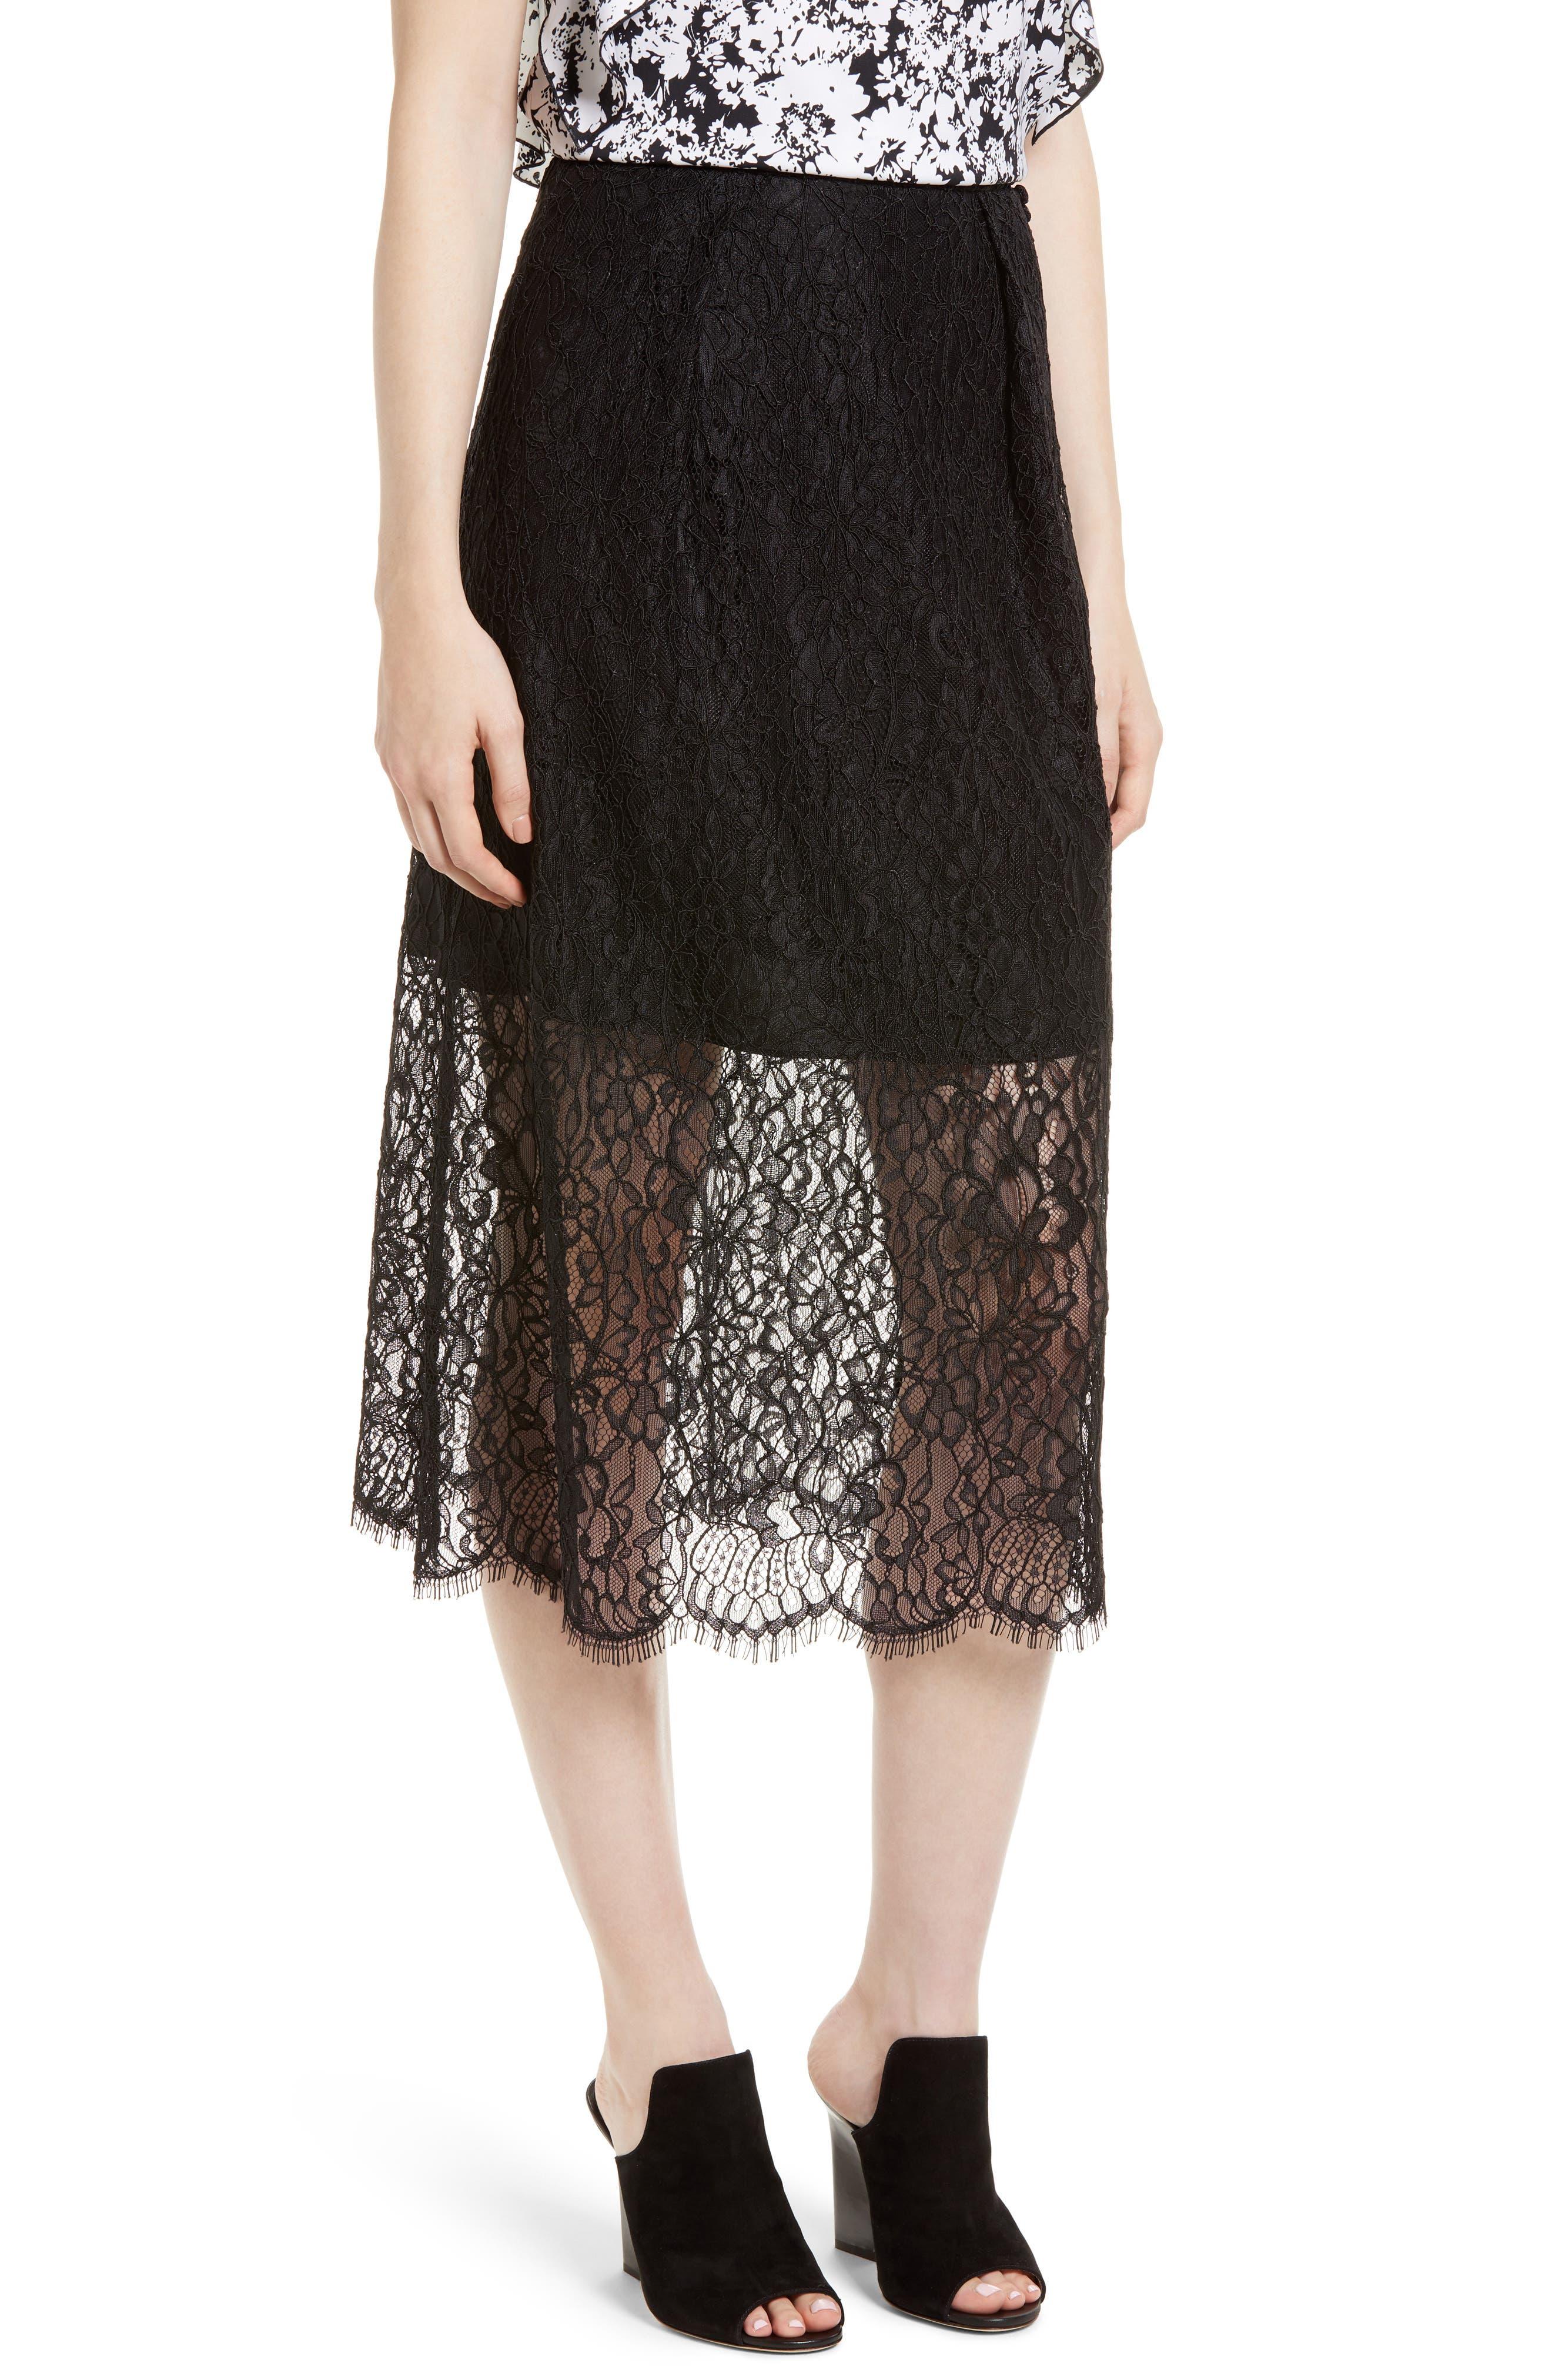 Alternate Image 1 Selected - Lewit Lace Midi Skirt